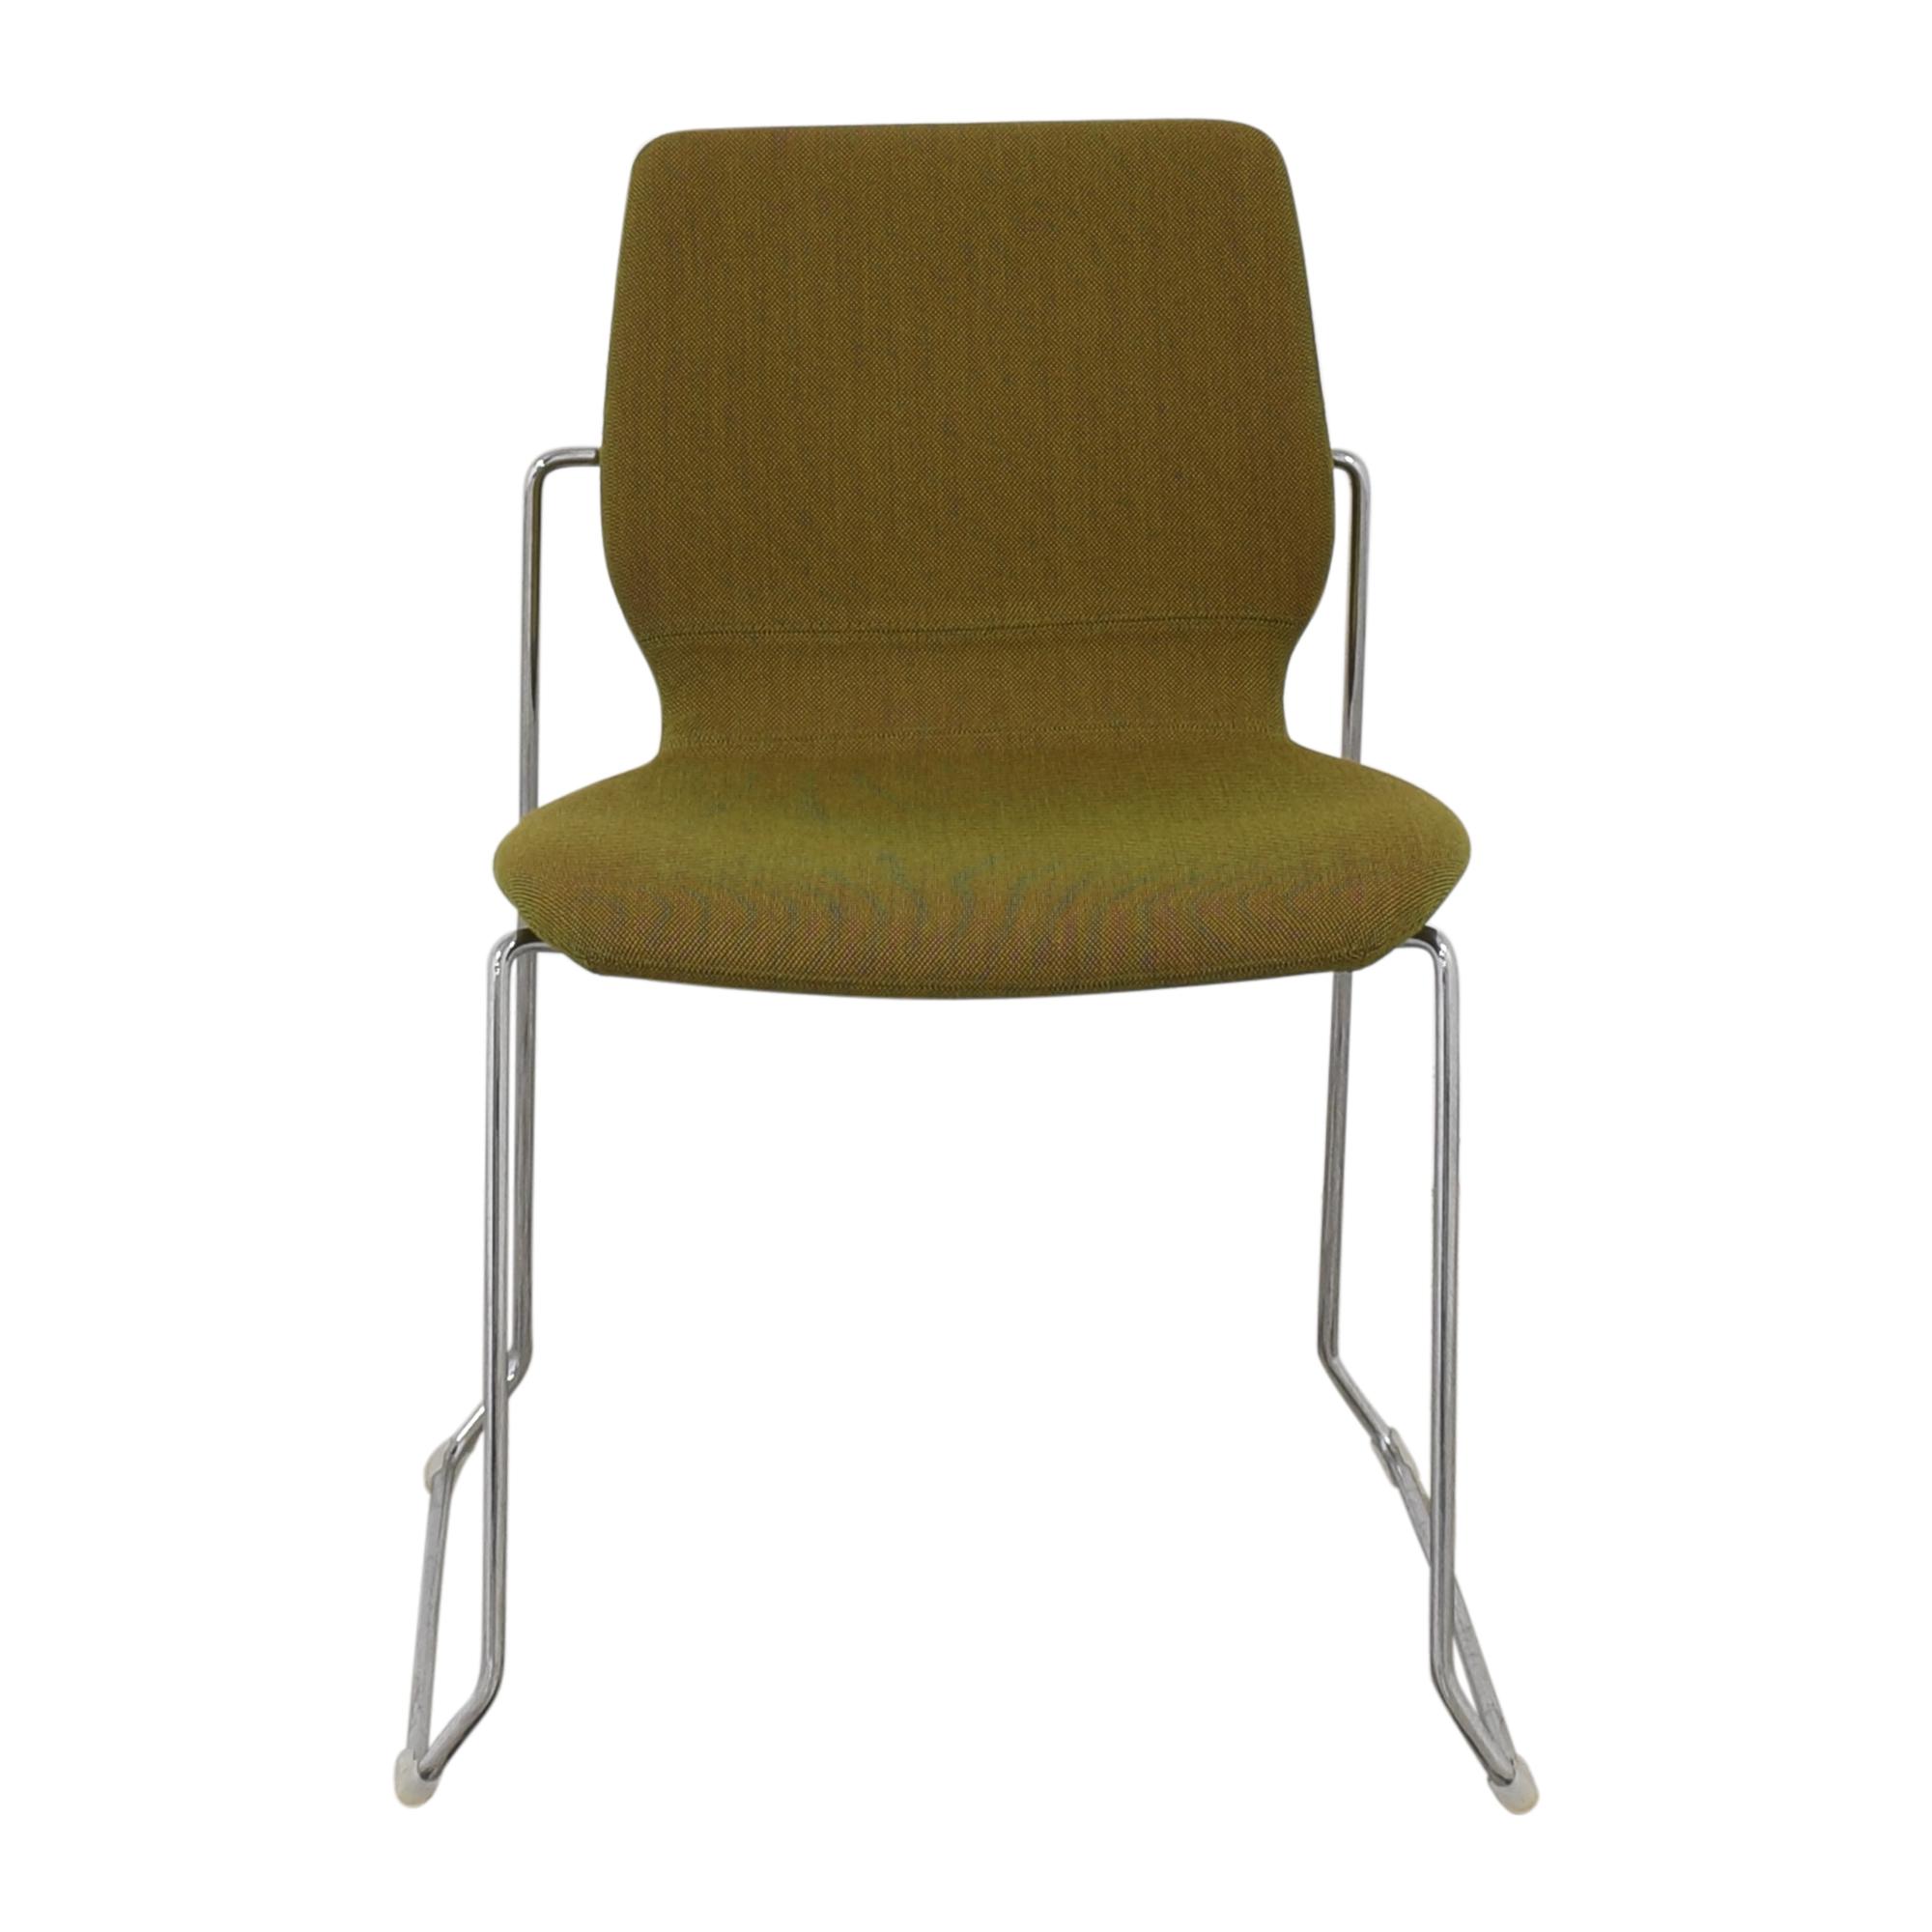 Koleksiyon Koleksiyon Asanda Armless Chair dimensions